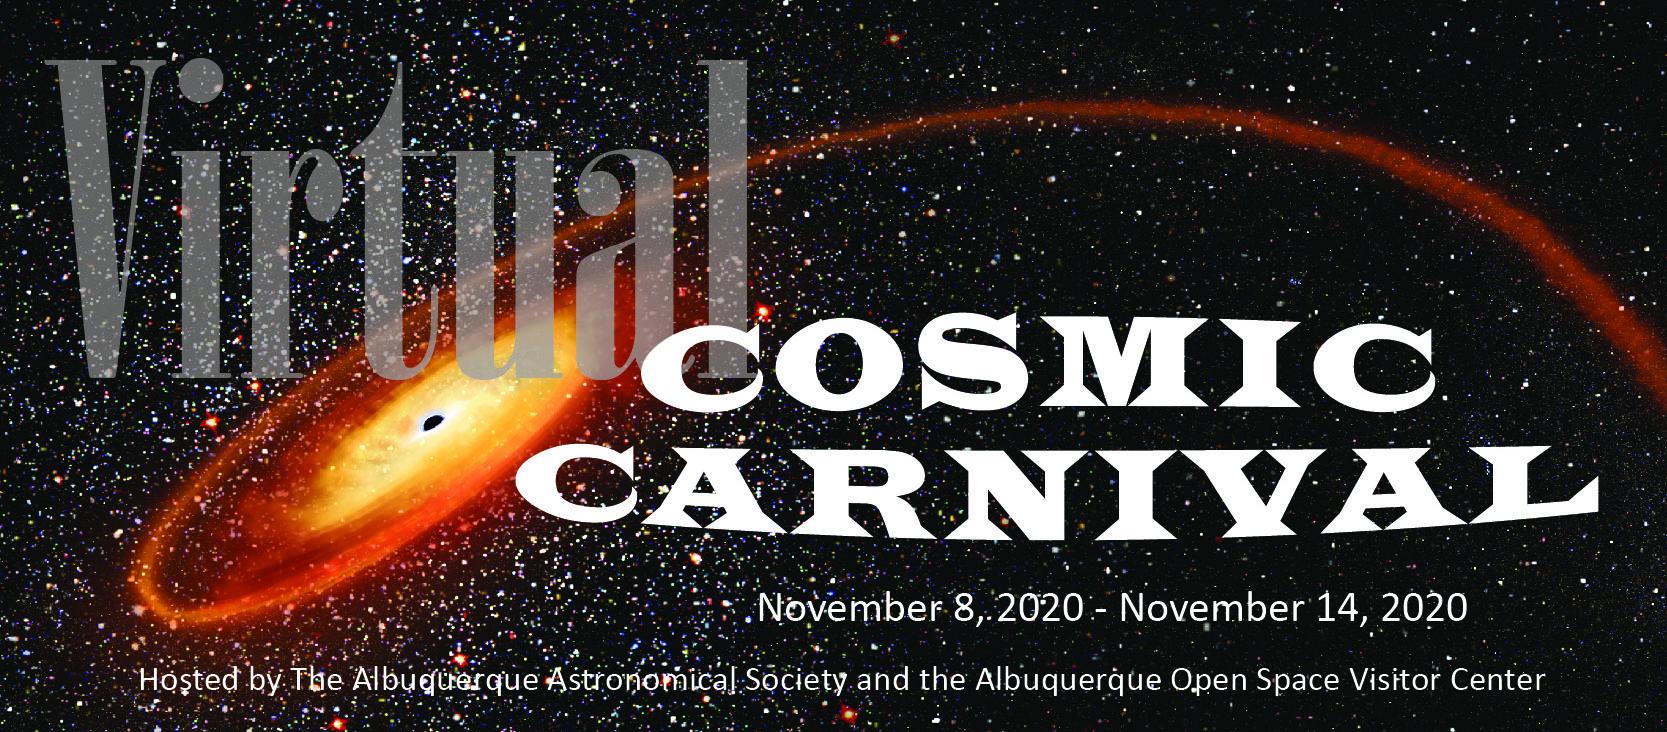 image of Cosmic Carnival banner